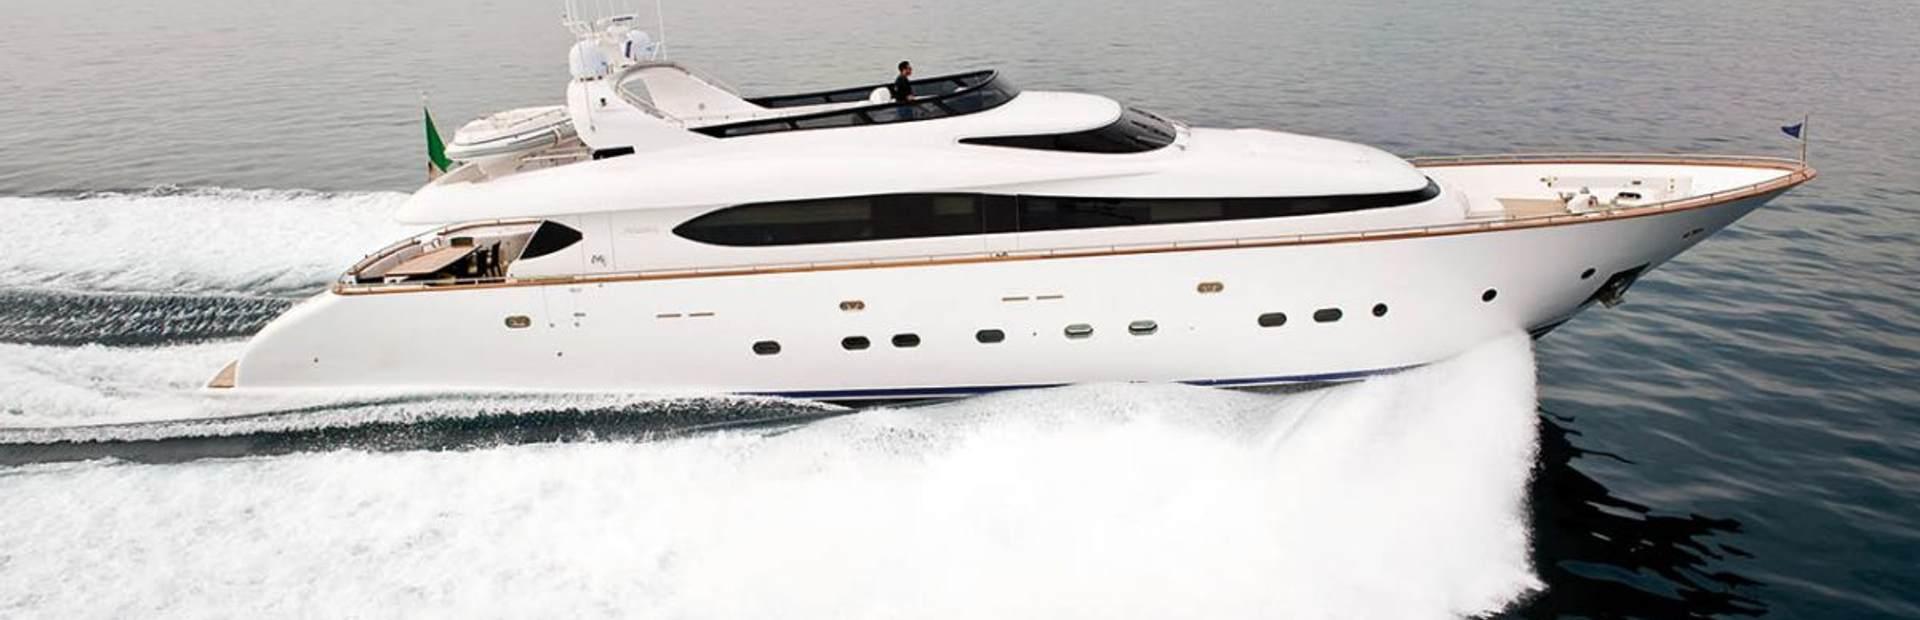 Maiora 31DP Yacht Charter